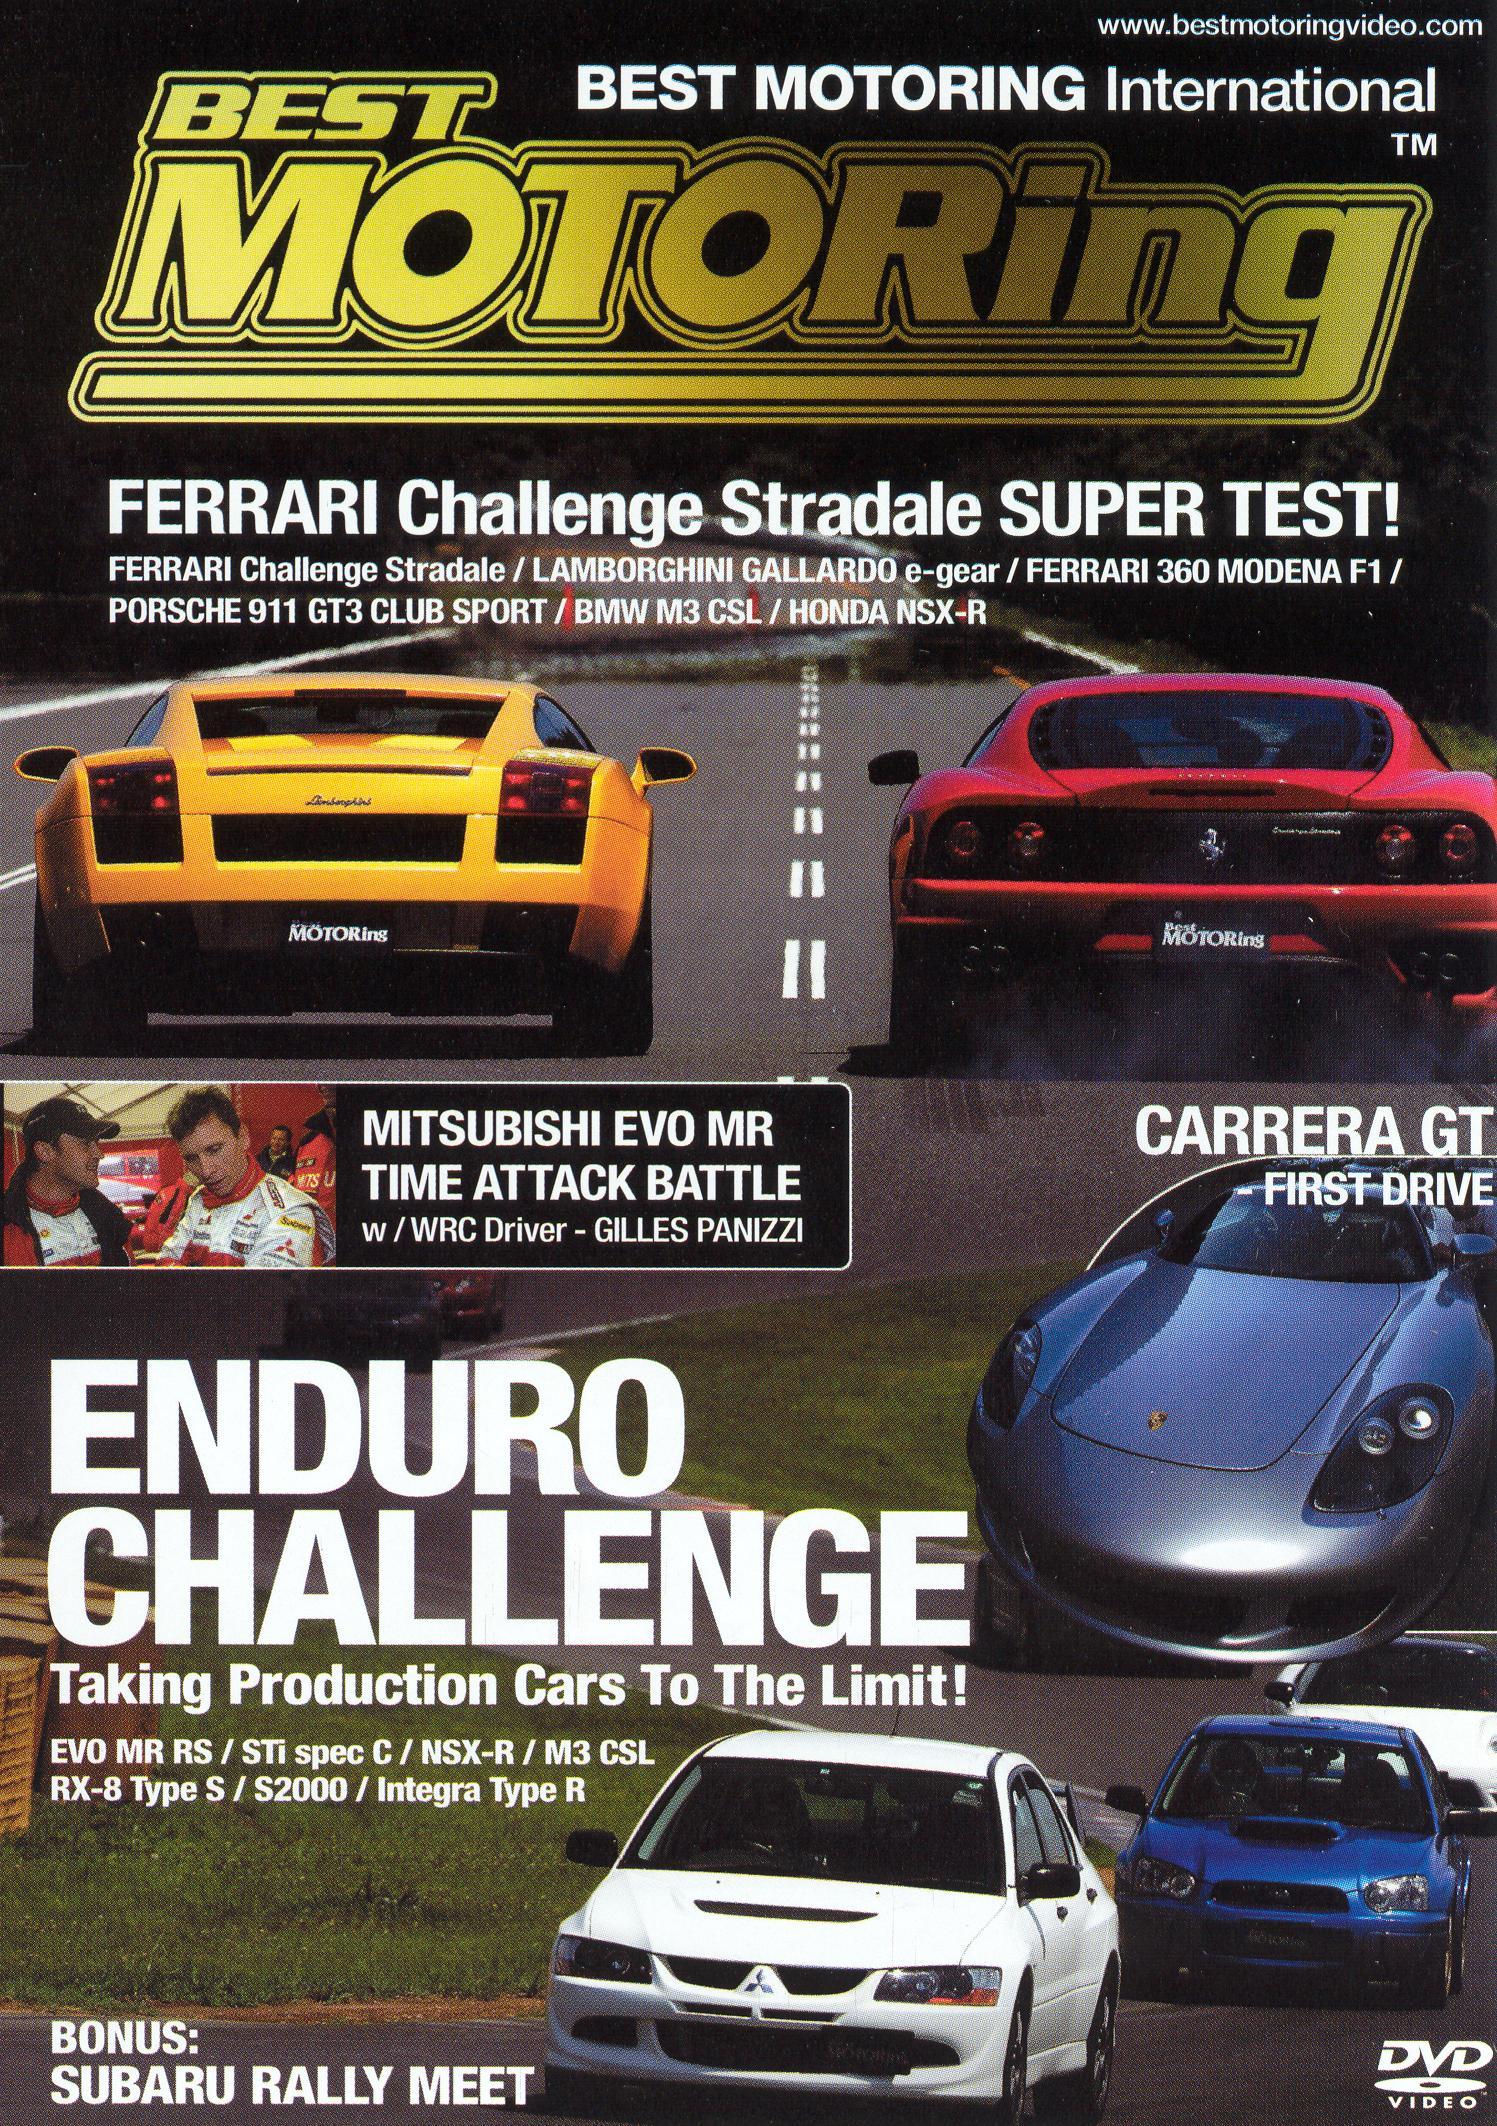 Best Motoring: Enduro Challenge